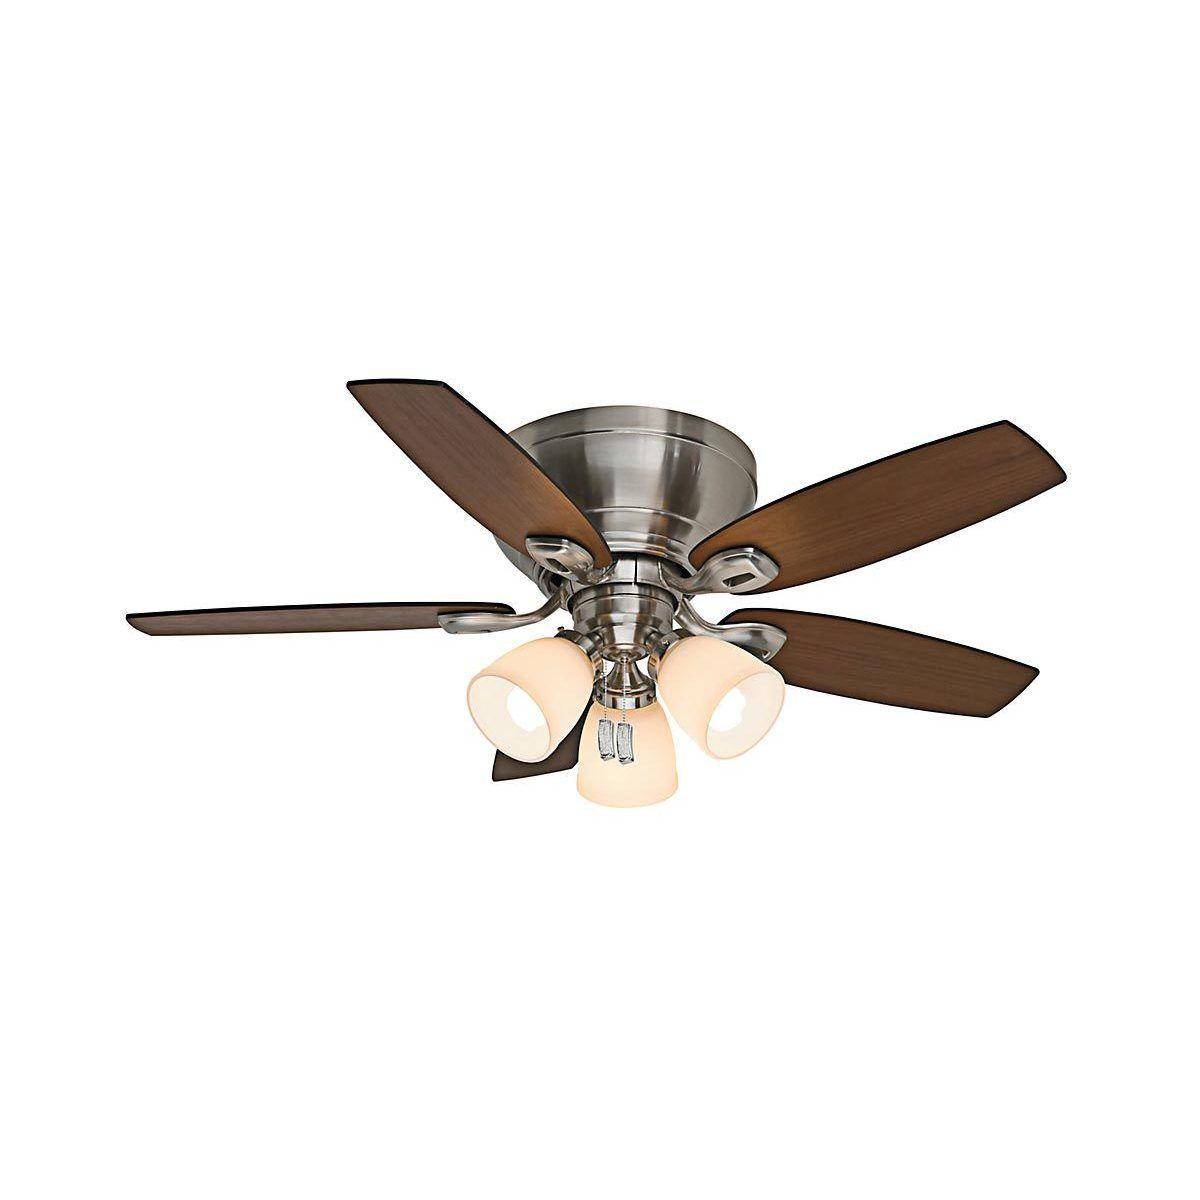 Casablanca 44 Inch Durant Low Profile Brushed Nickel Reversible Blade Ceiling Fan Flush Mount Ceiling Fan Ceiling Fan Brushed Nickel Ceiling Fan